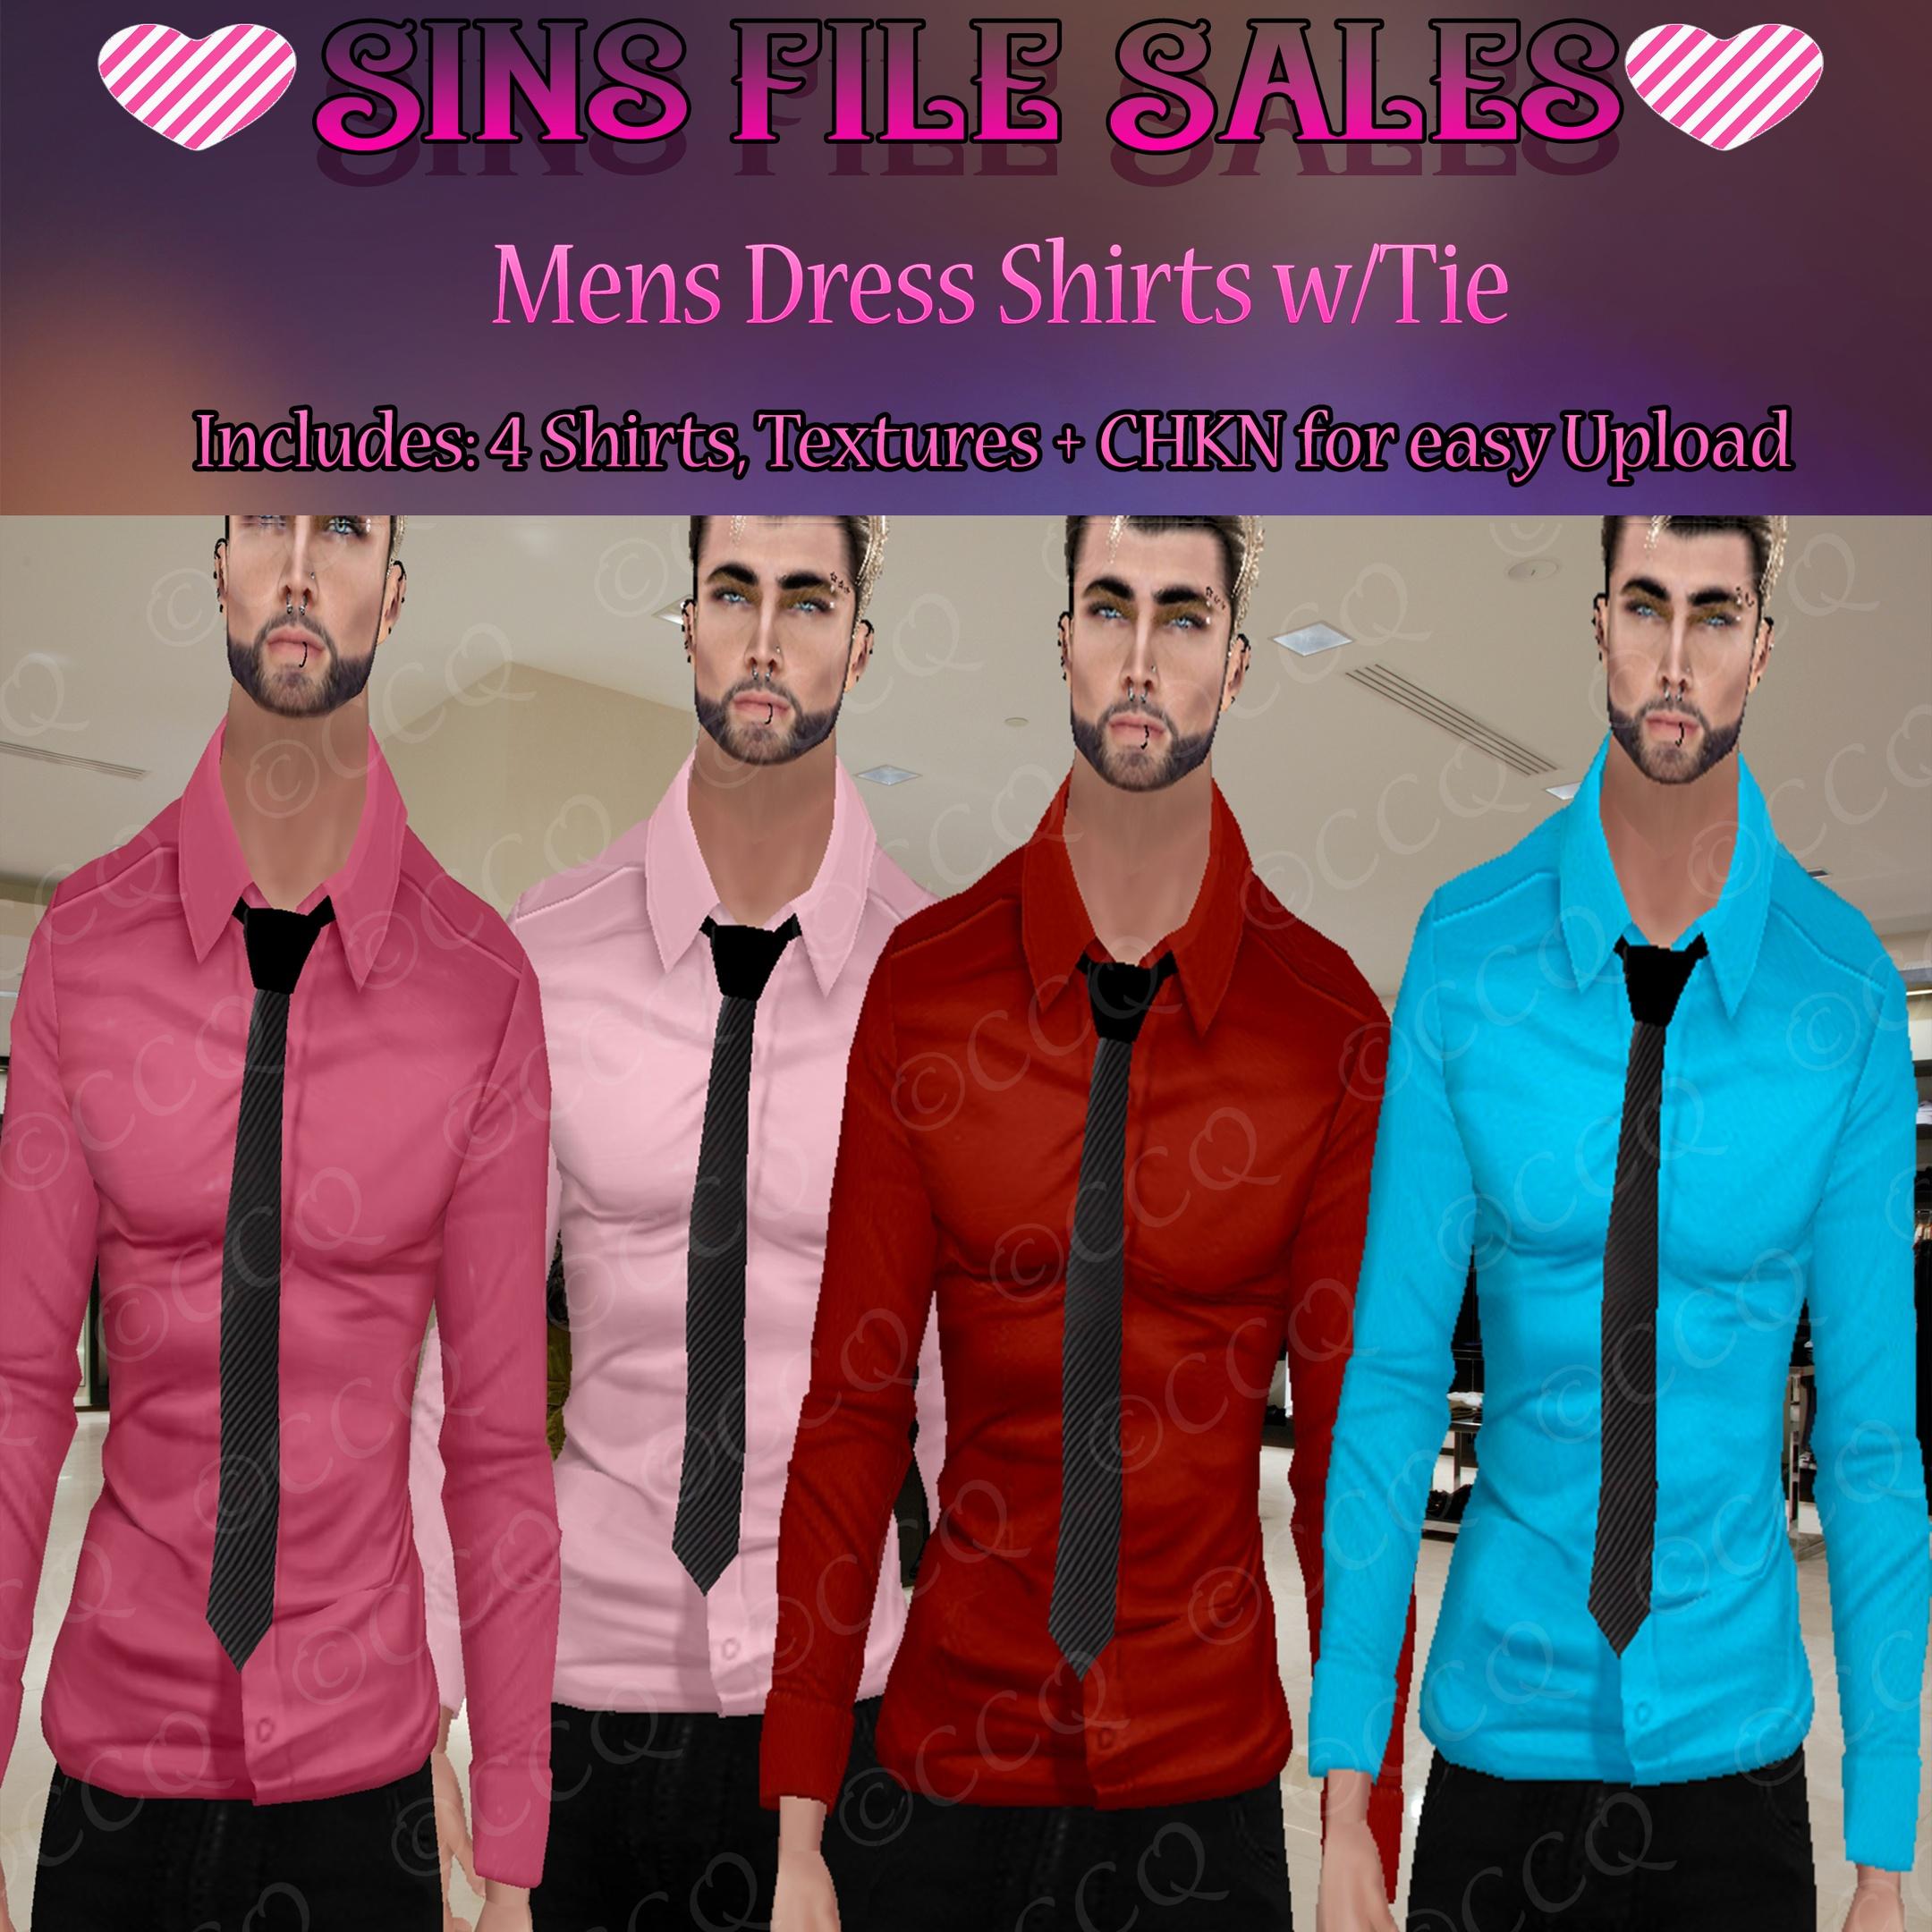 Mens Dress Shirt w/Tie